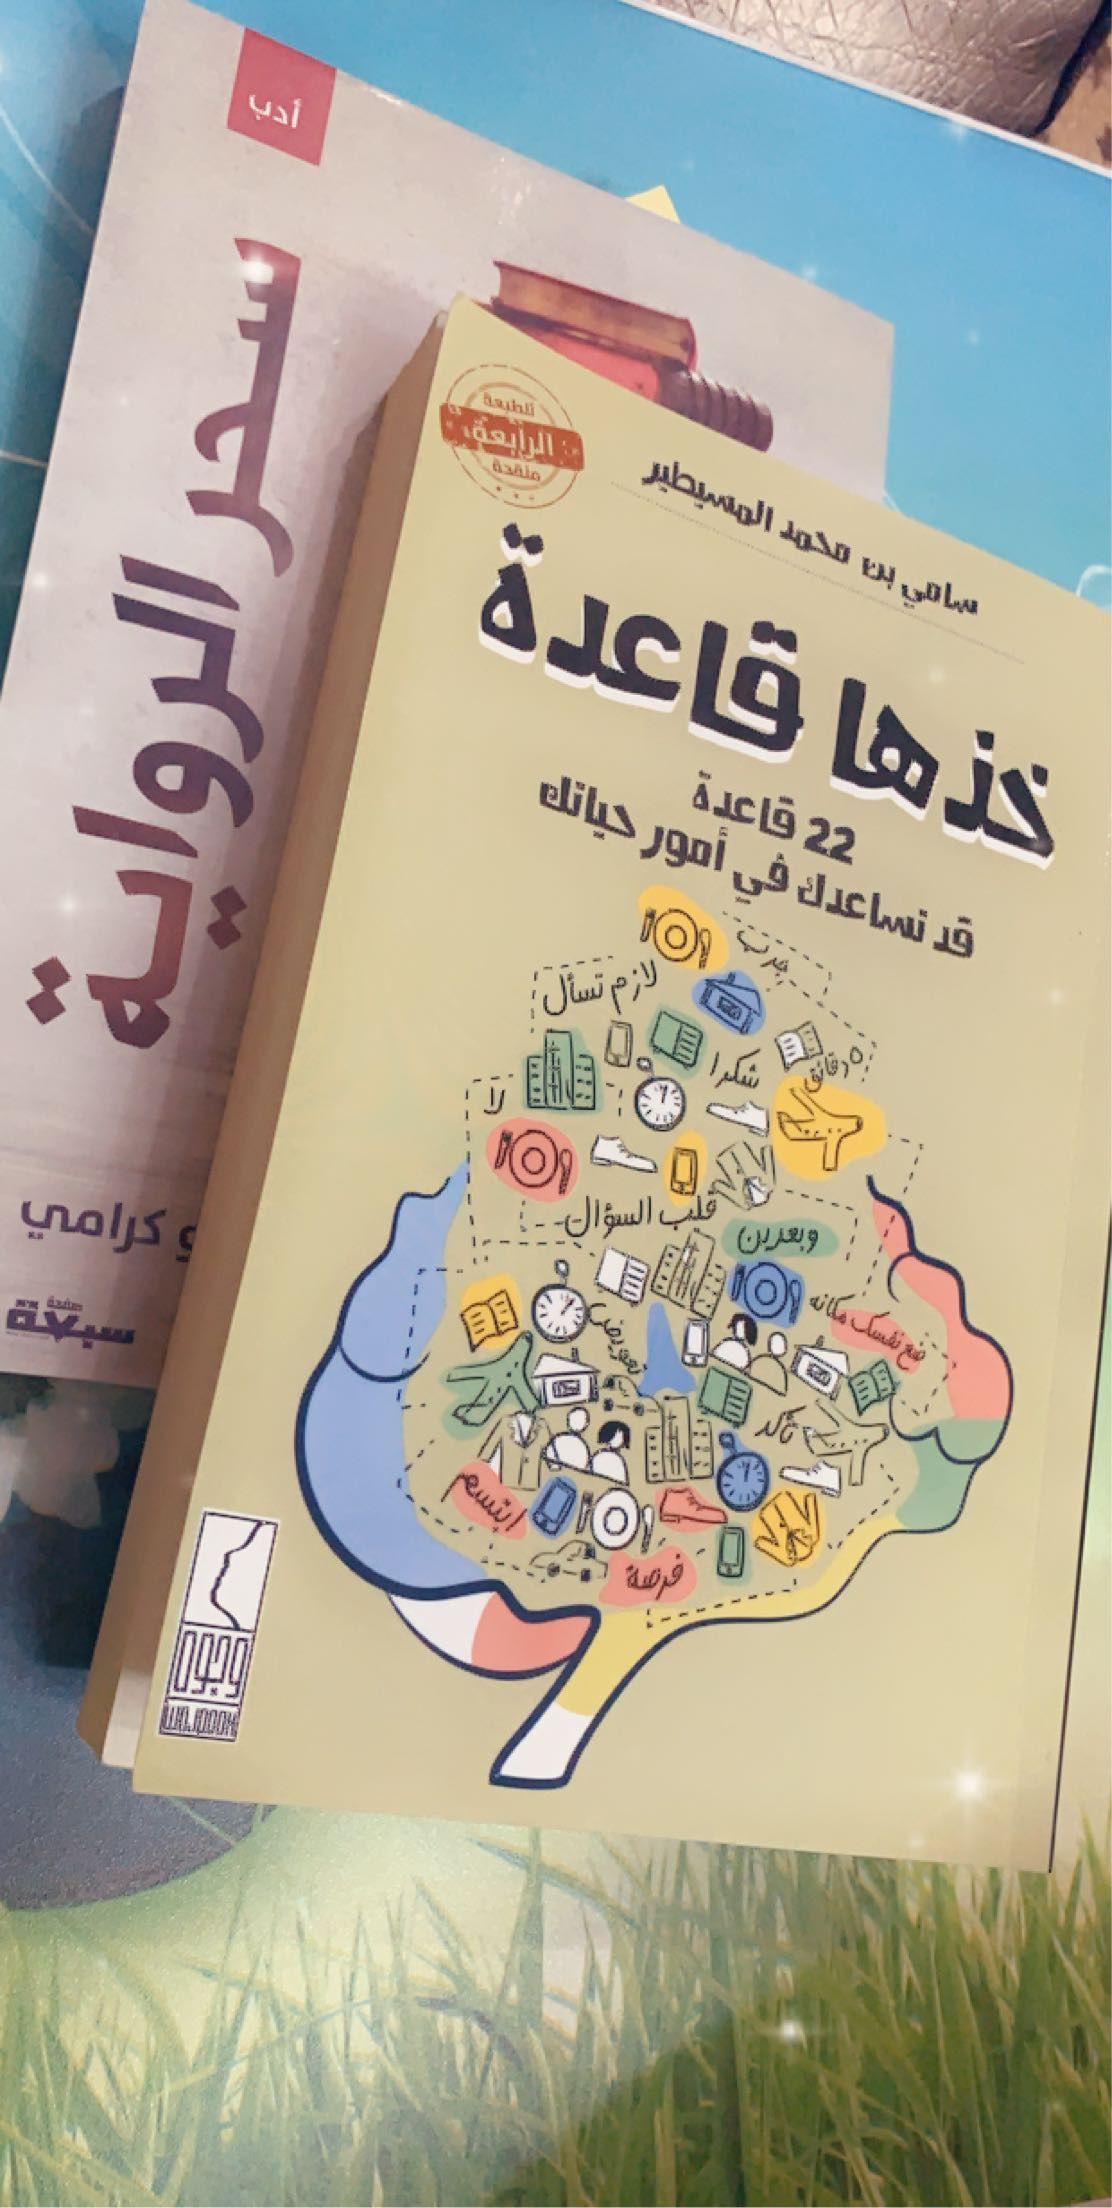 Http Saaid Net Book 22 16046 Pdf Books Inspirational Books My Books